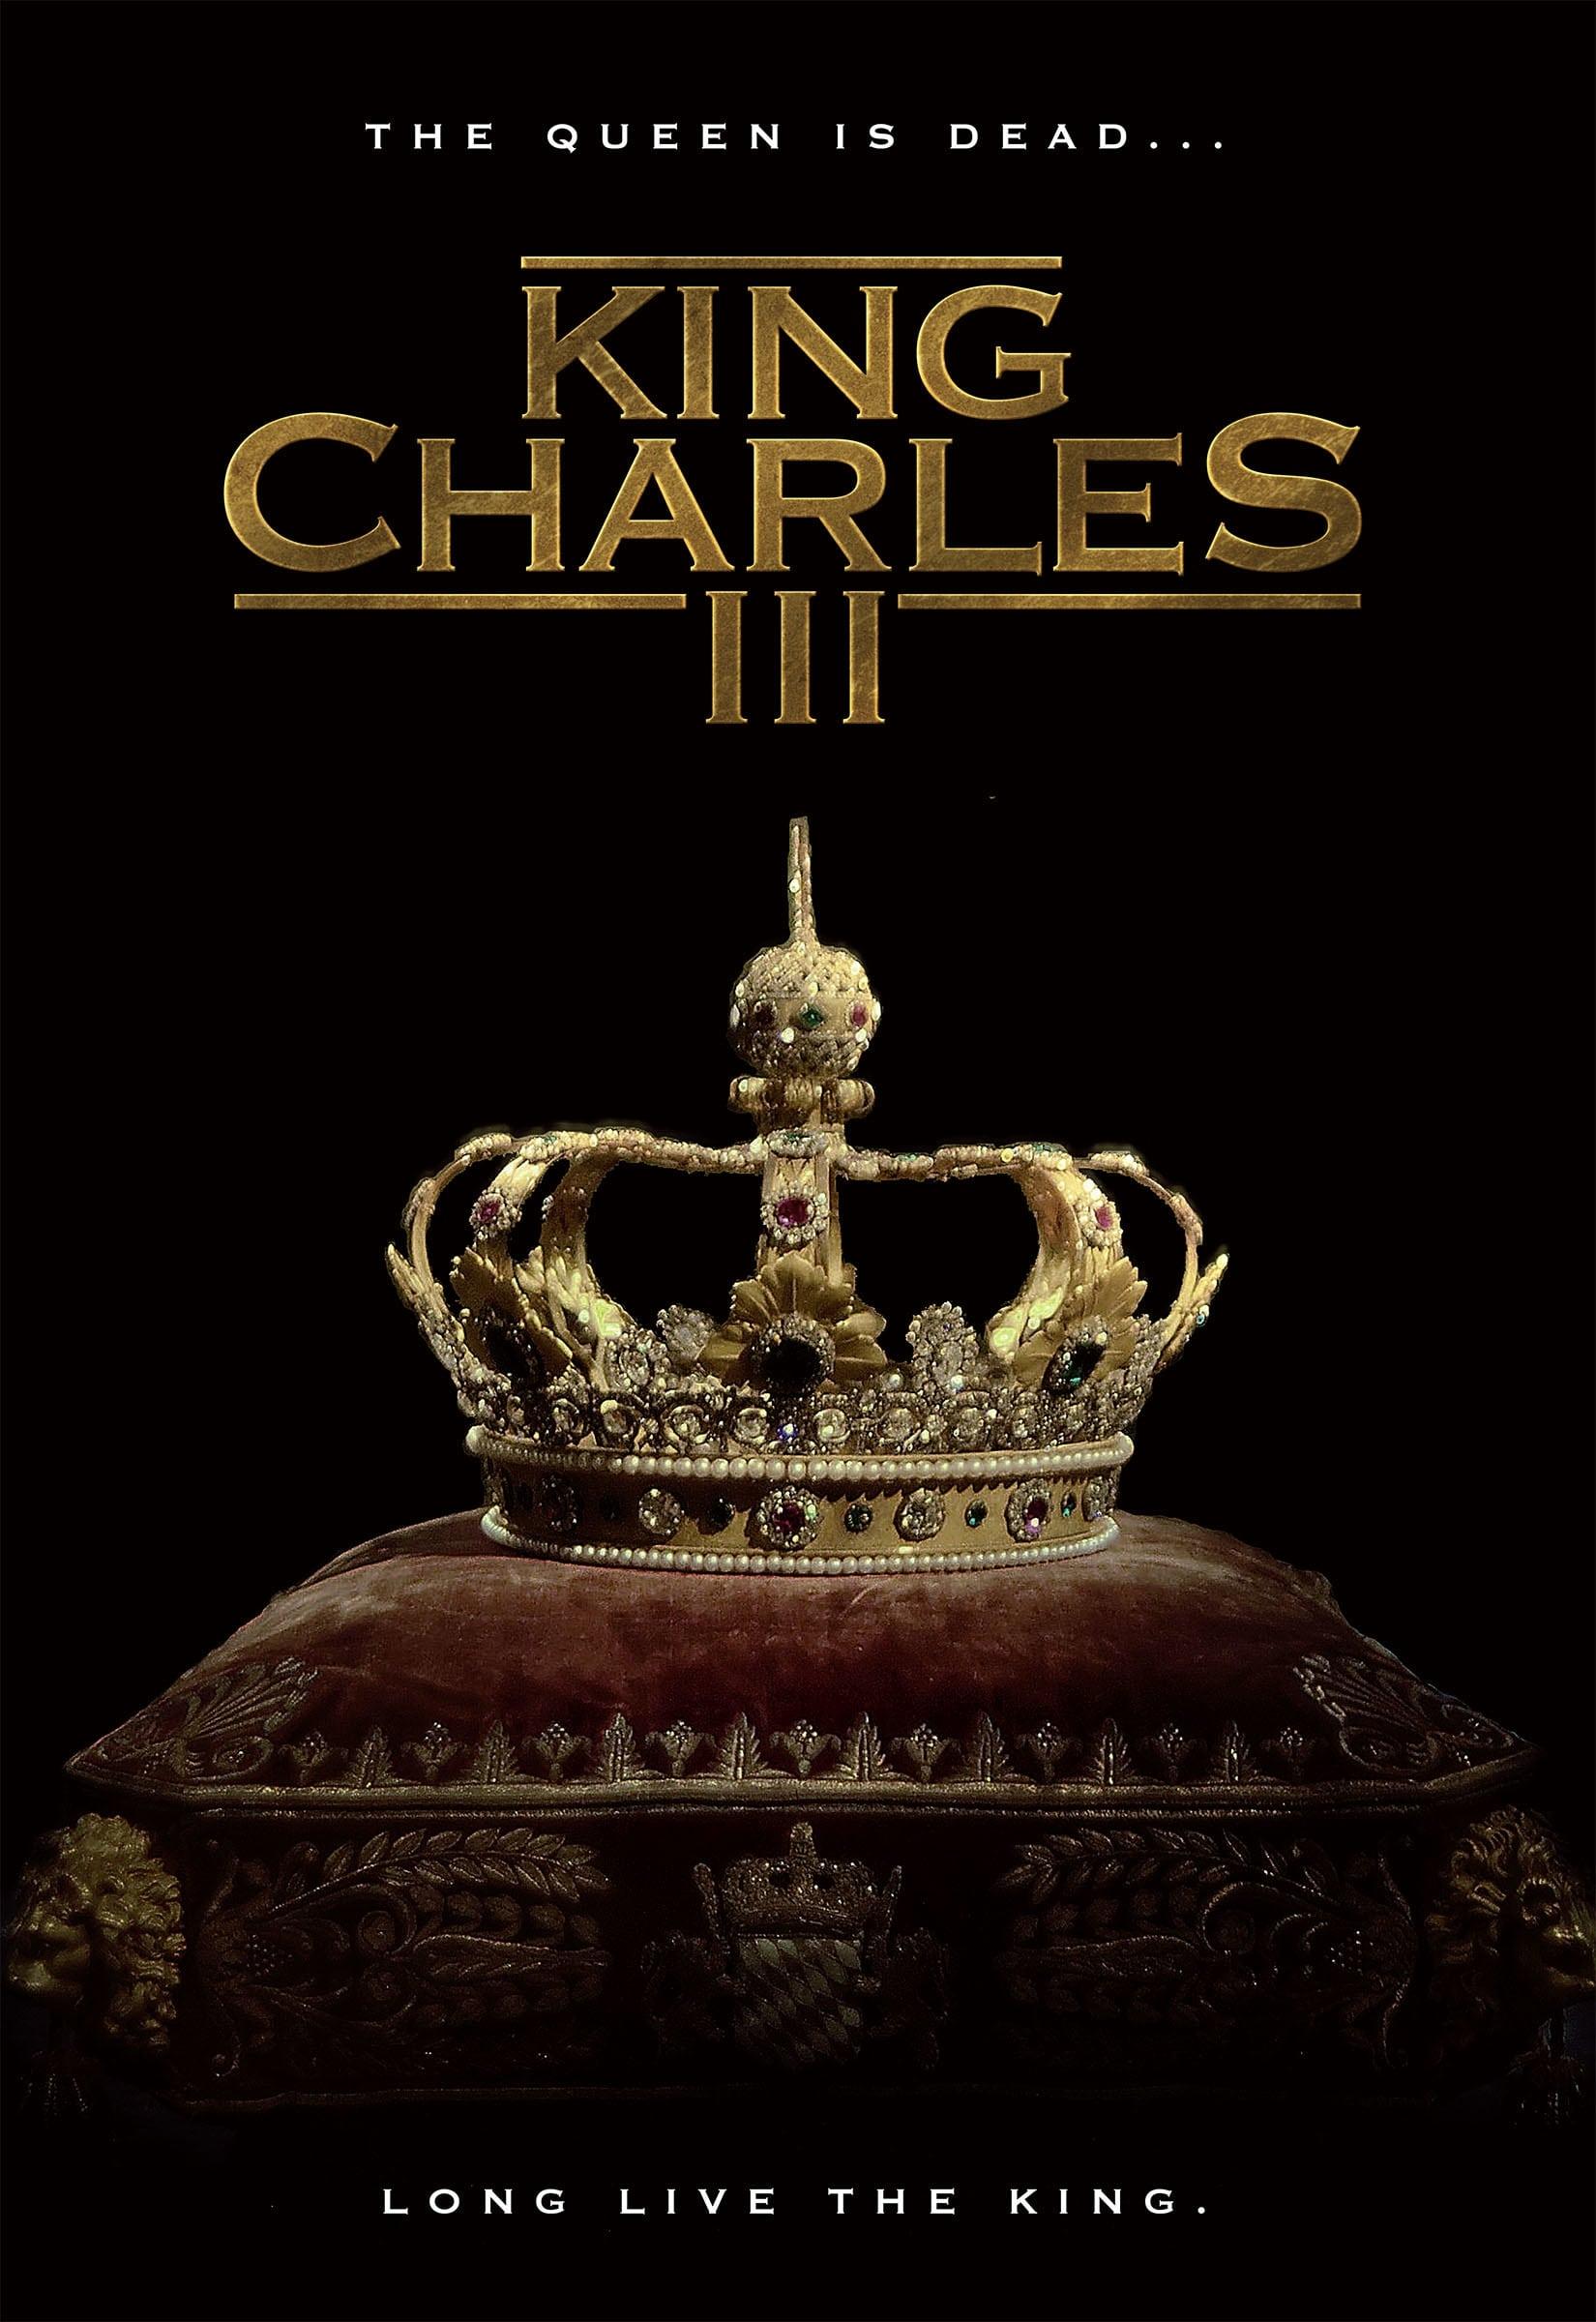 King Charles III putlocker 4k